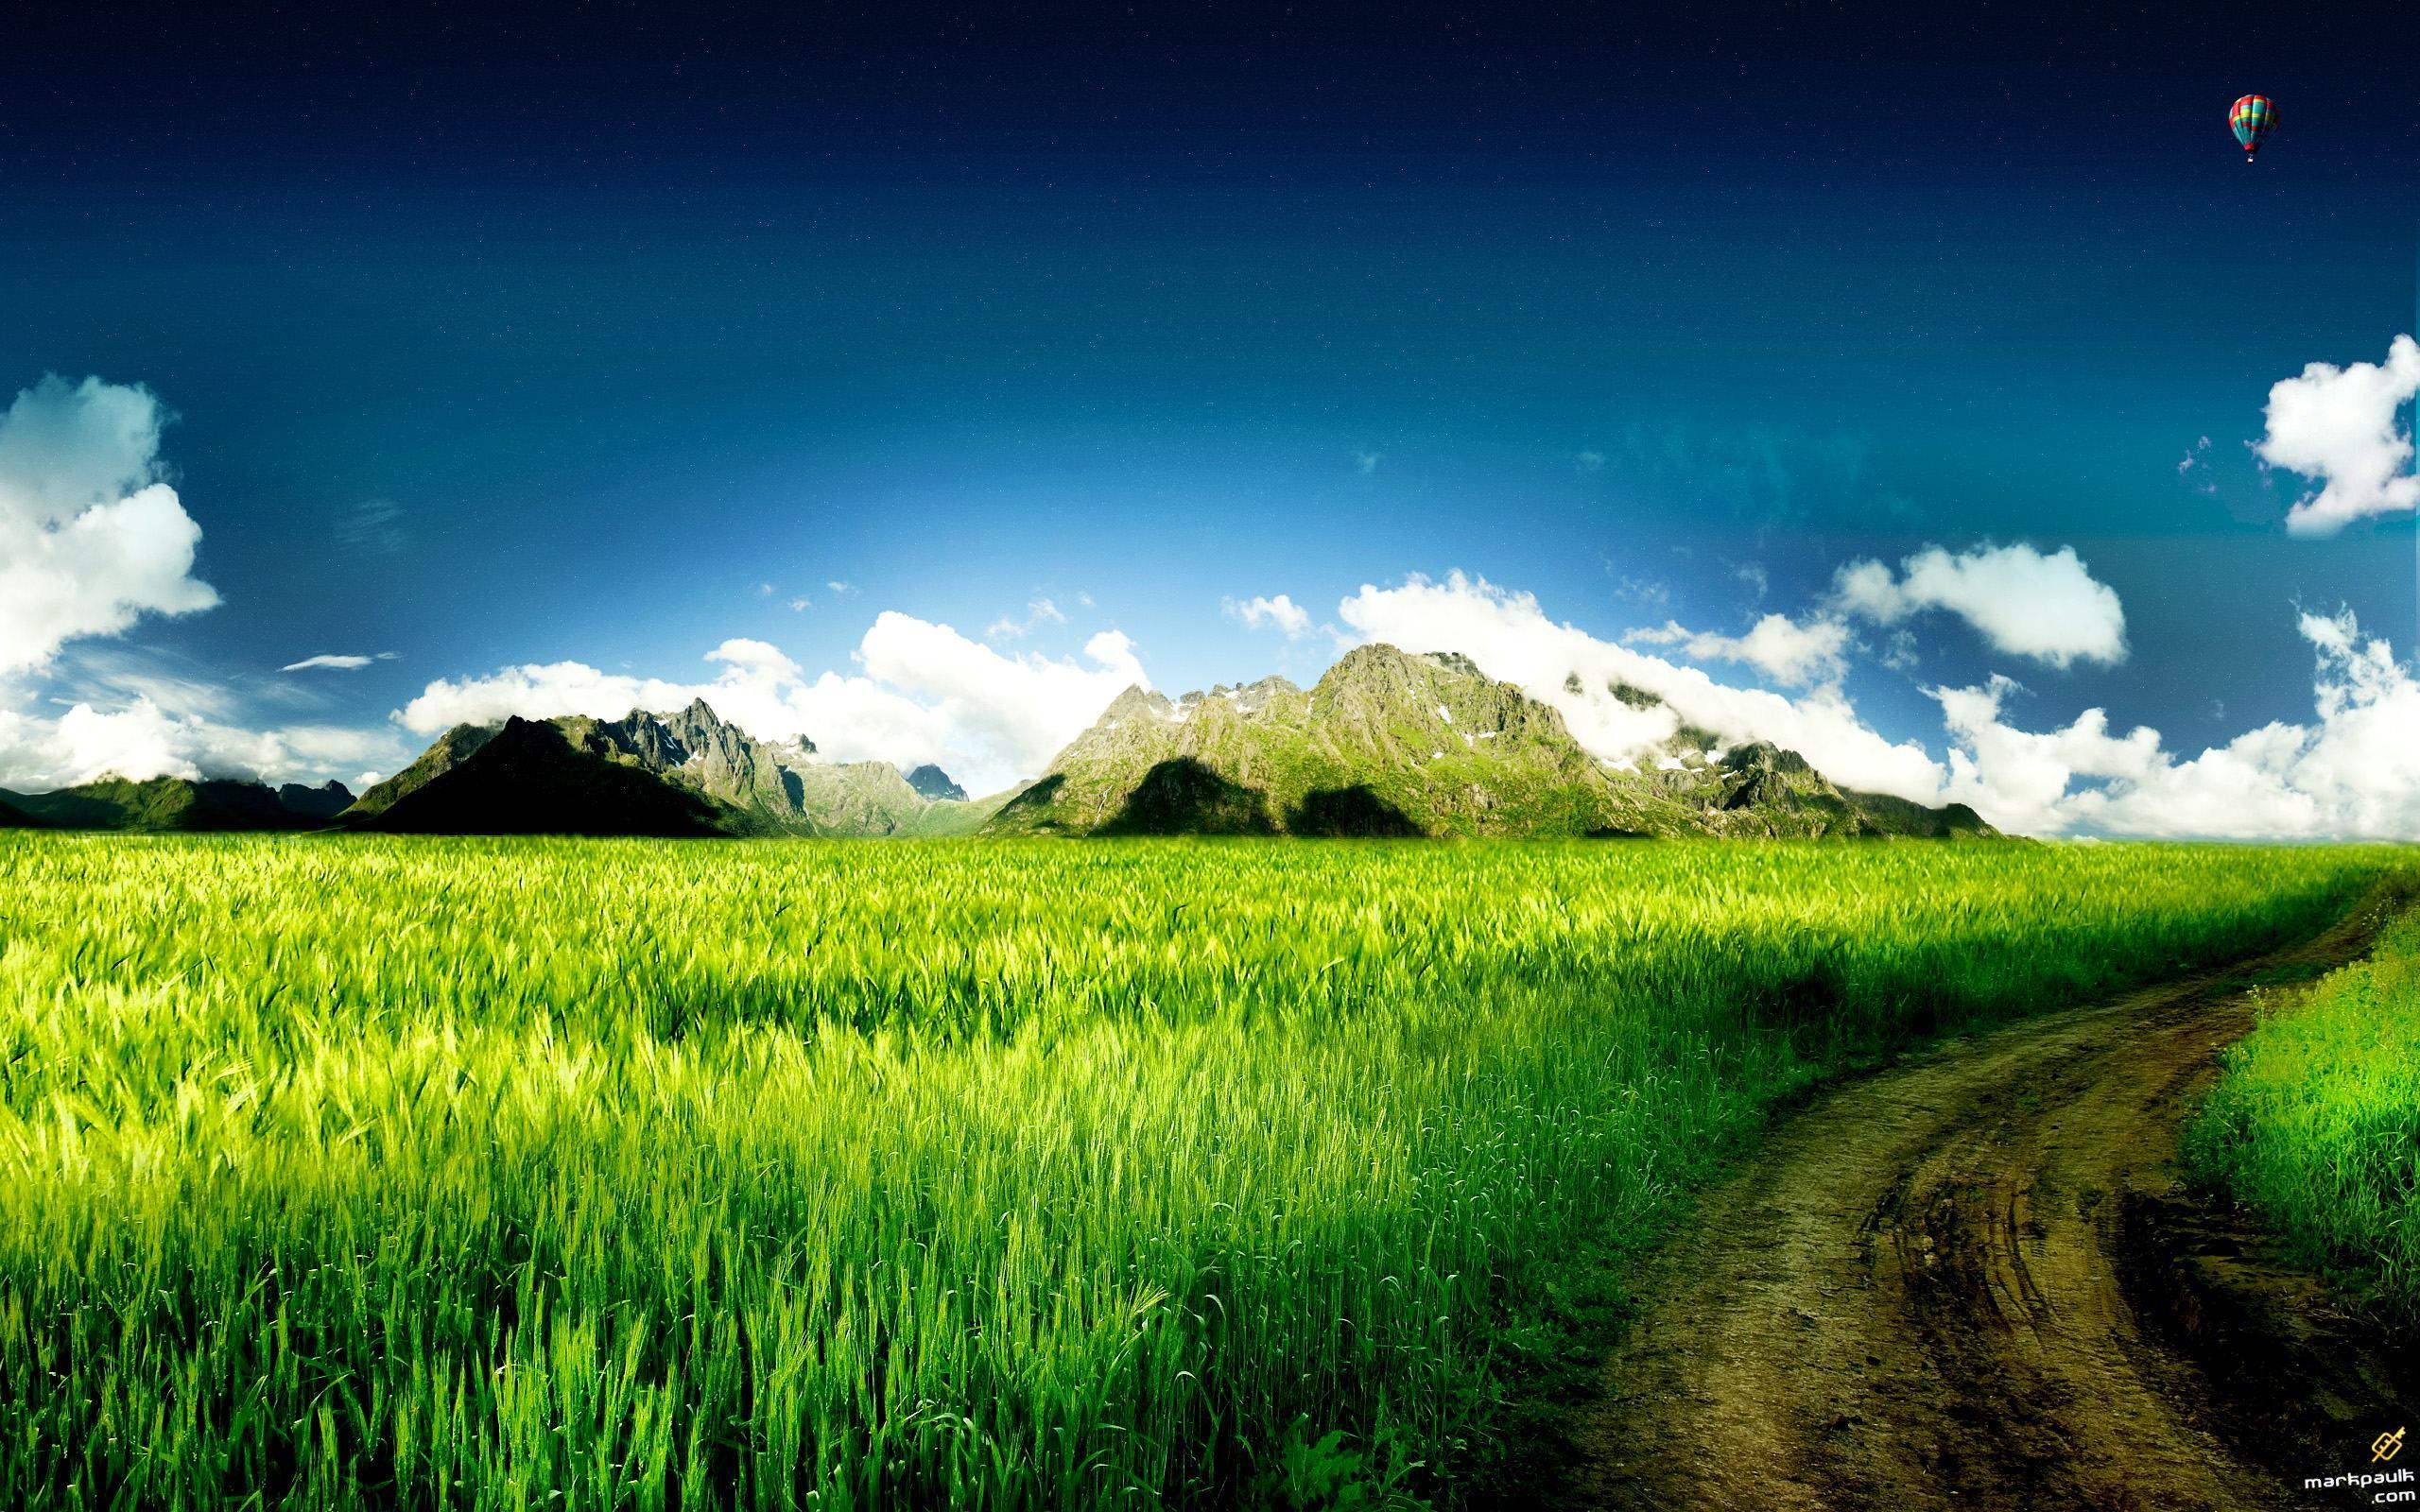 Beautiful Nature Scenery 1080P Hd Hd Background 9 HD Wallpapers